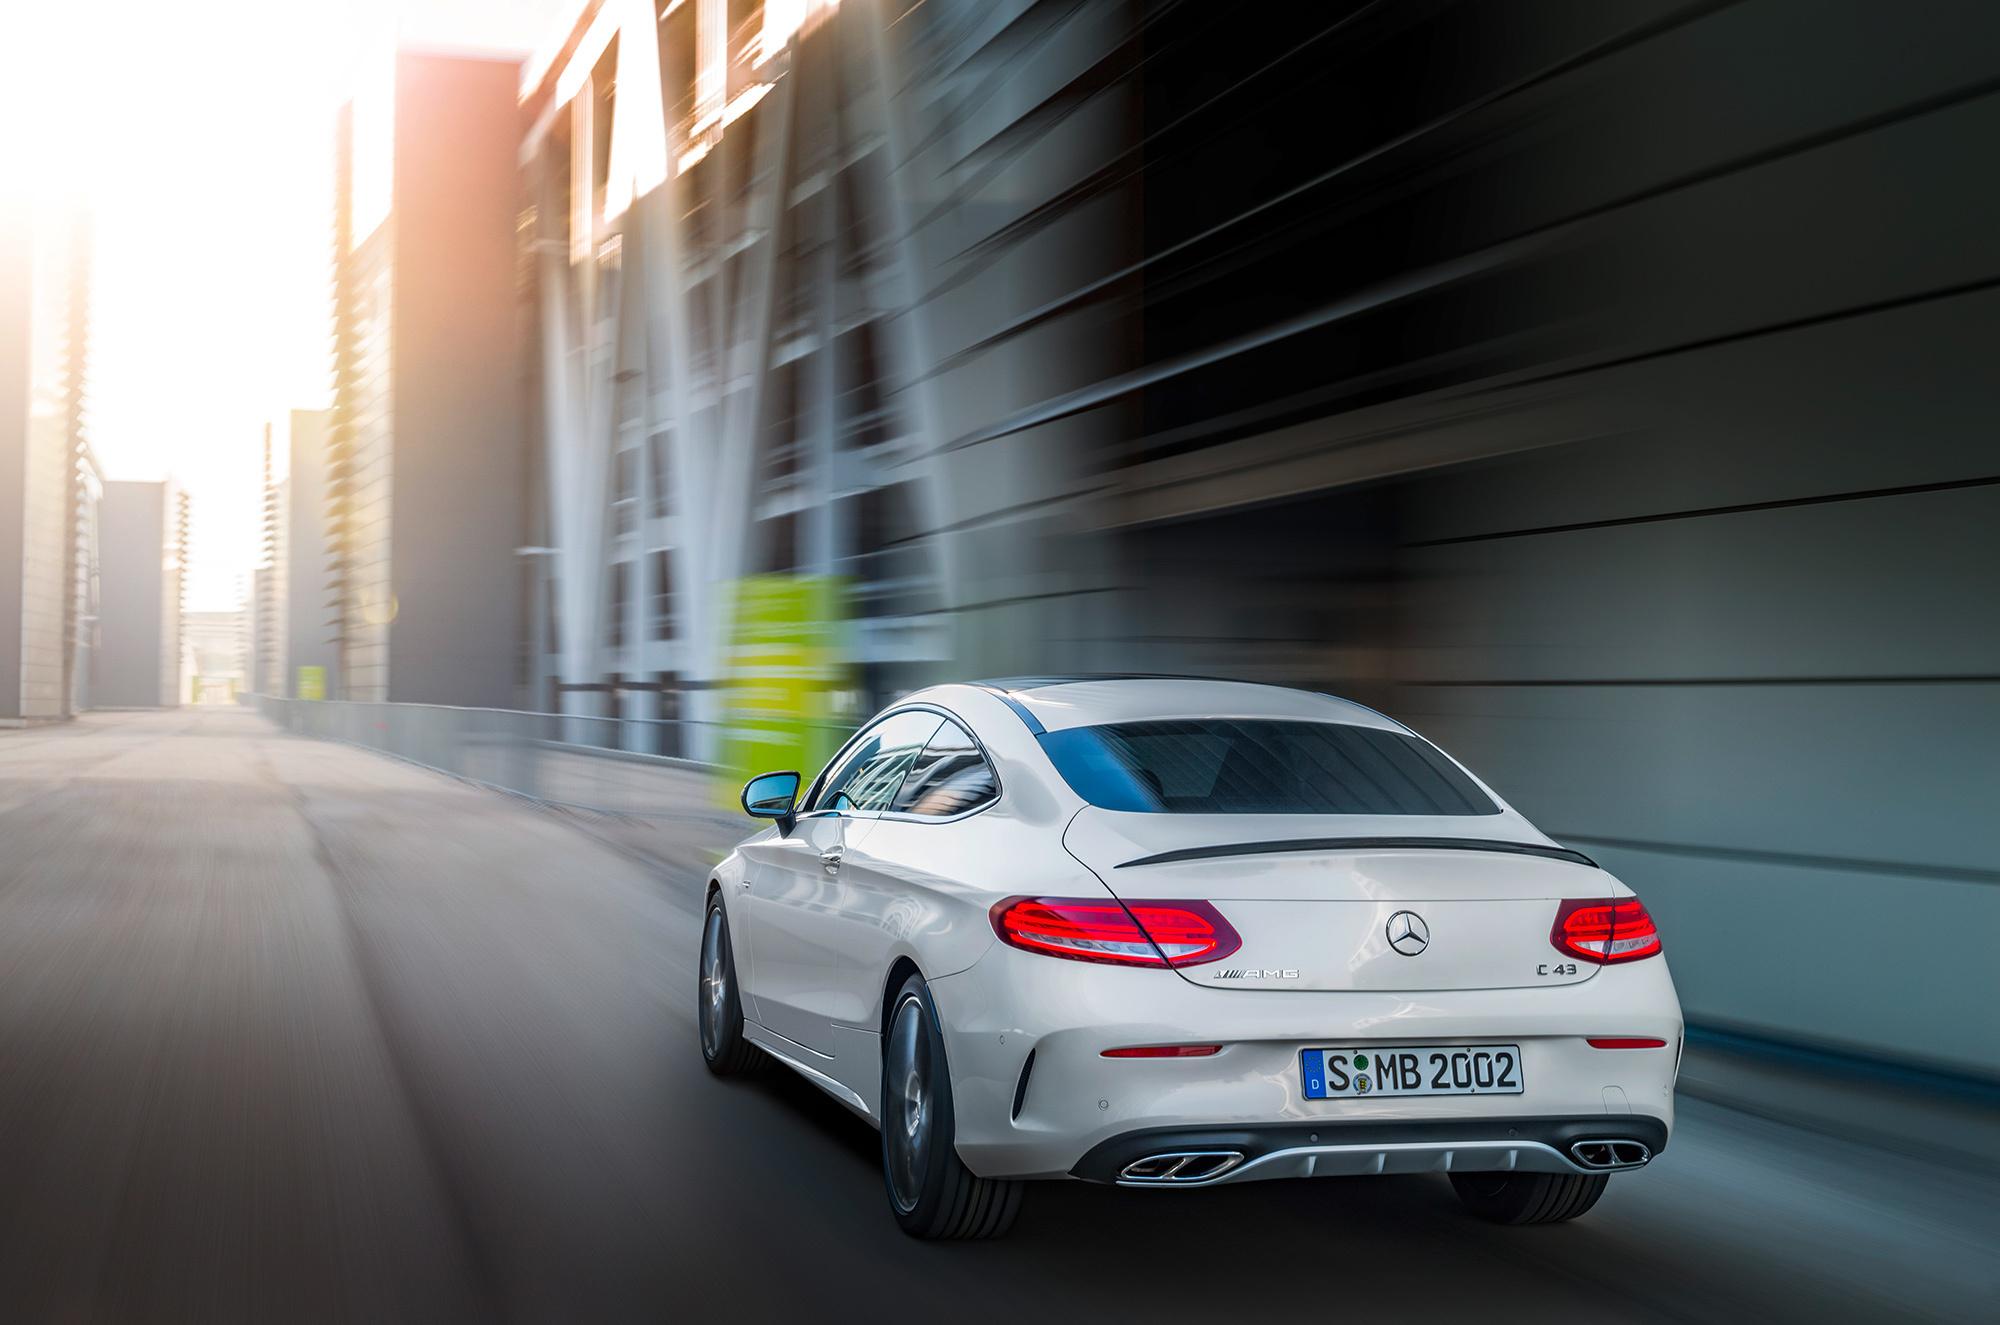 Mercedes AMG C 43 Widescreen